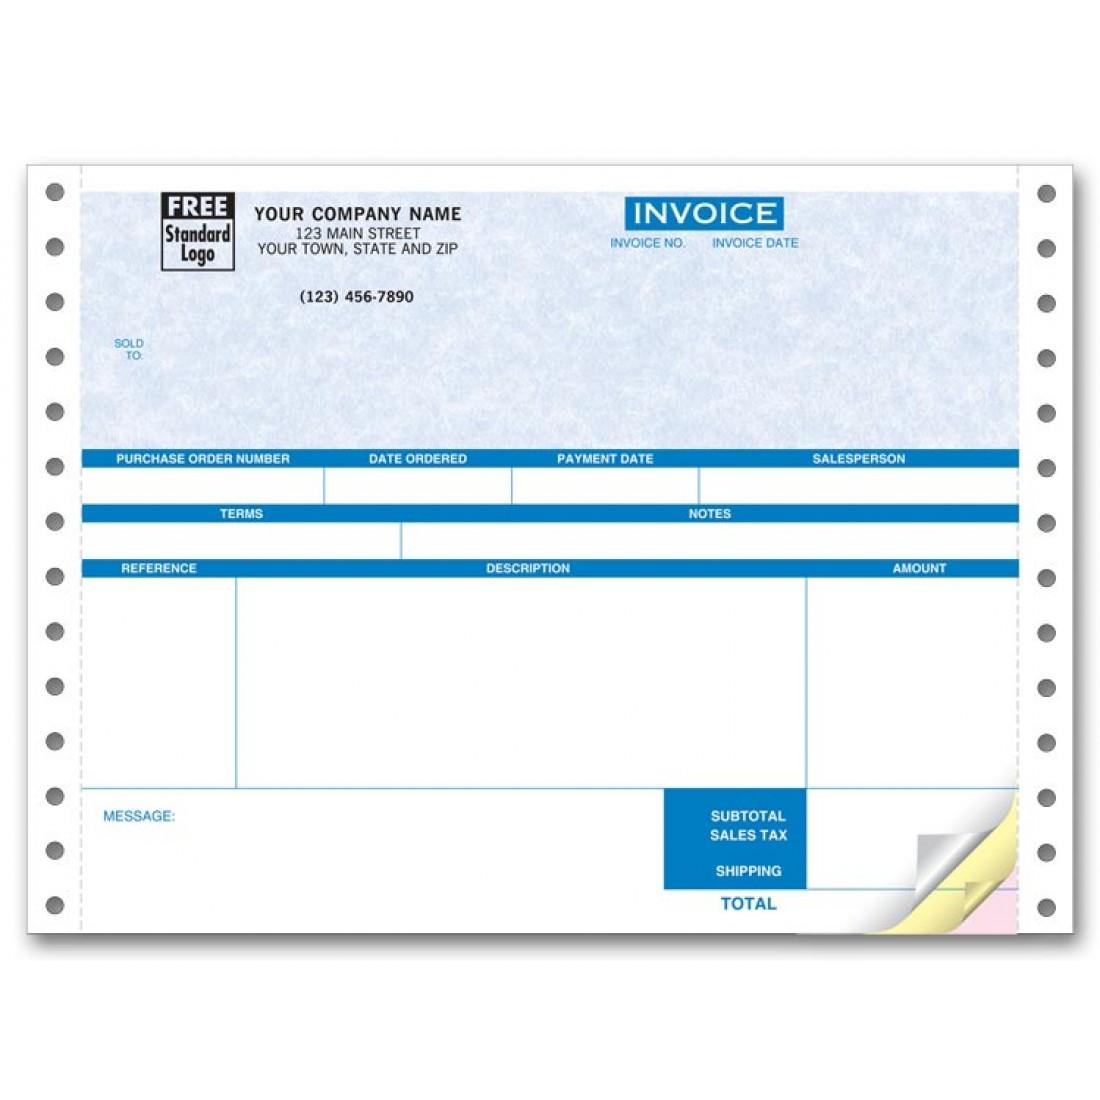 Continuous Service Invoice for One-Write Plus - Parchment